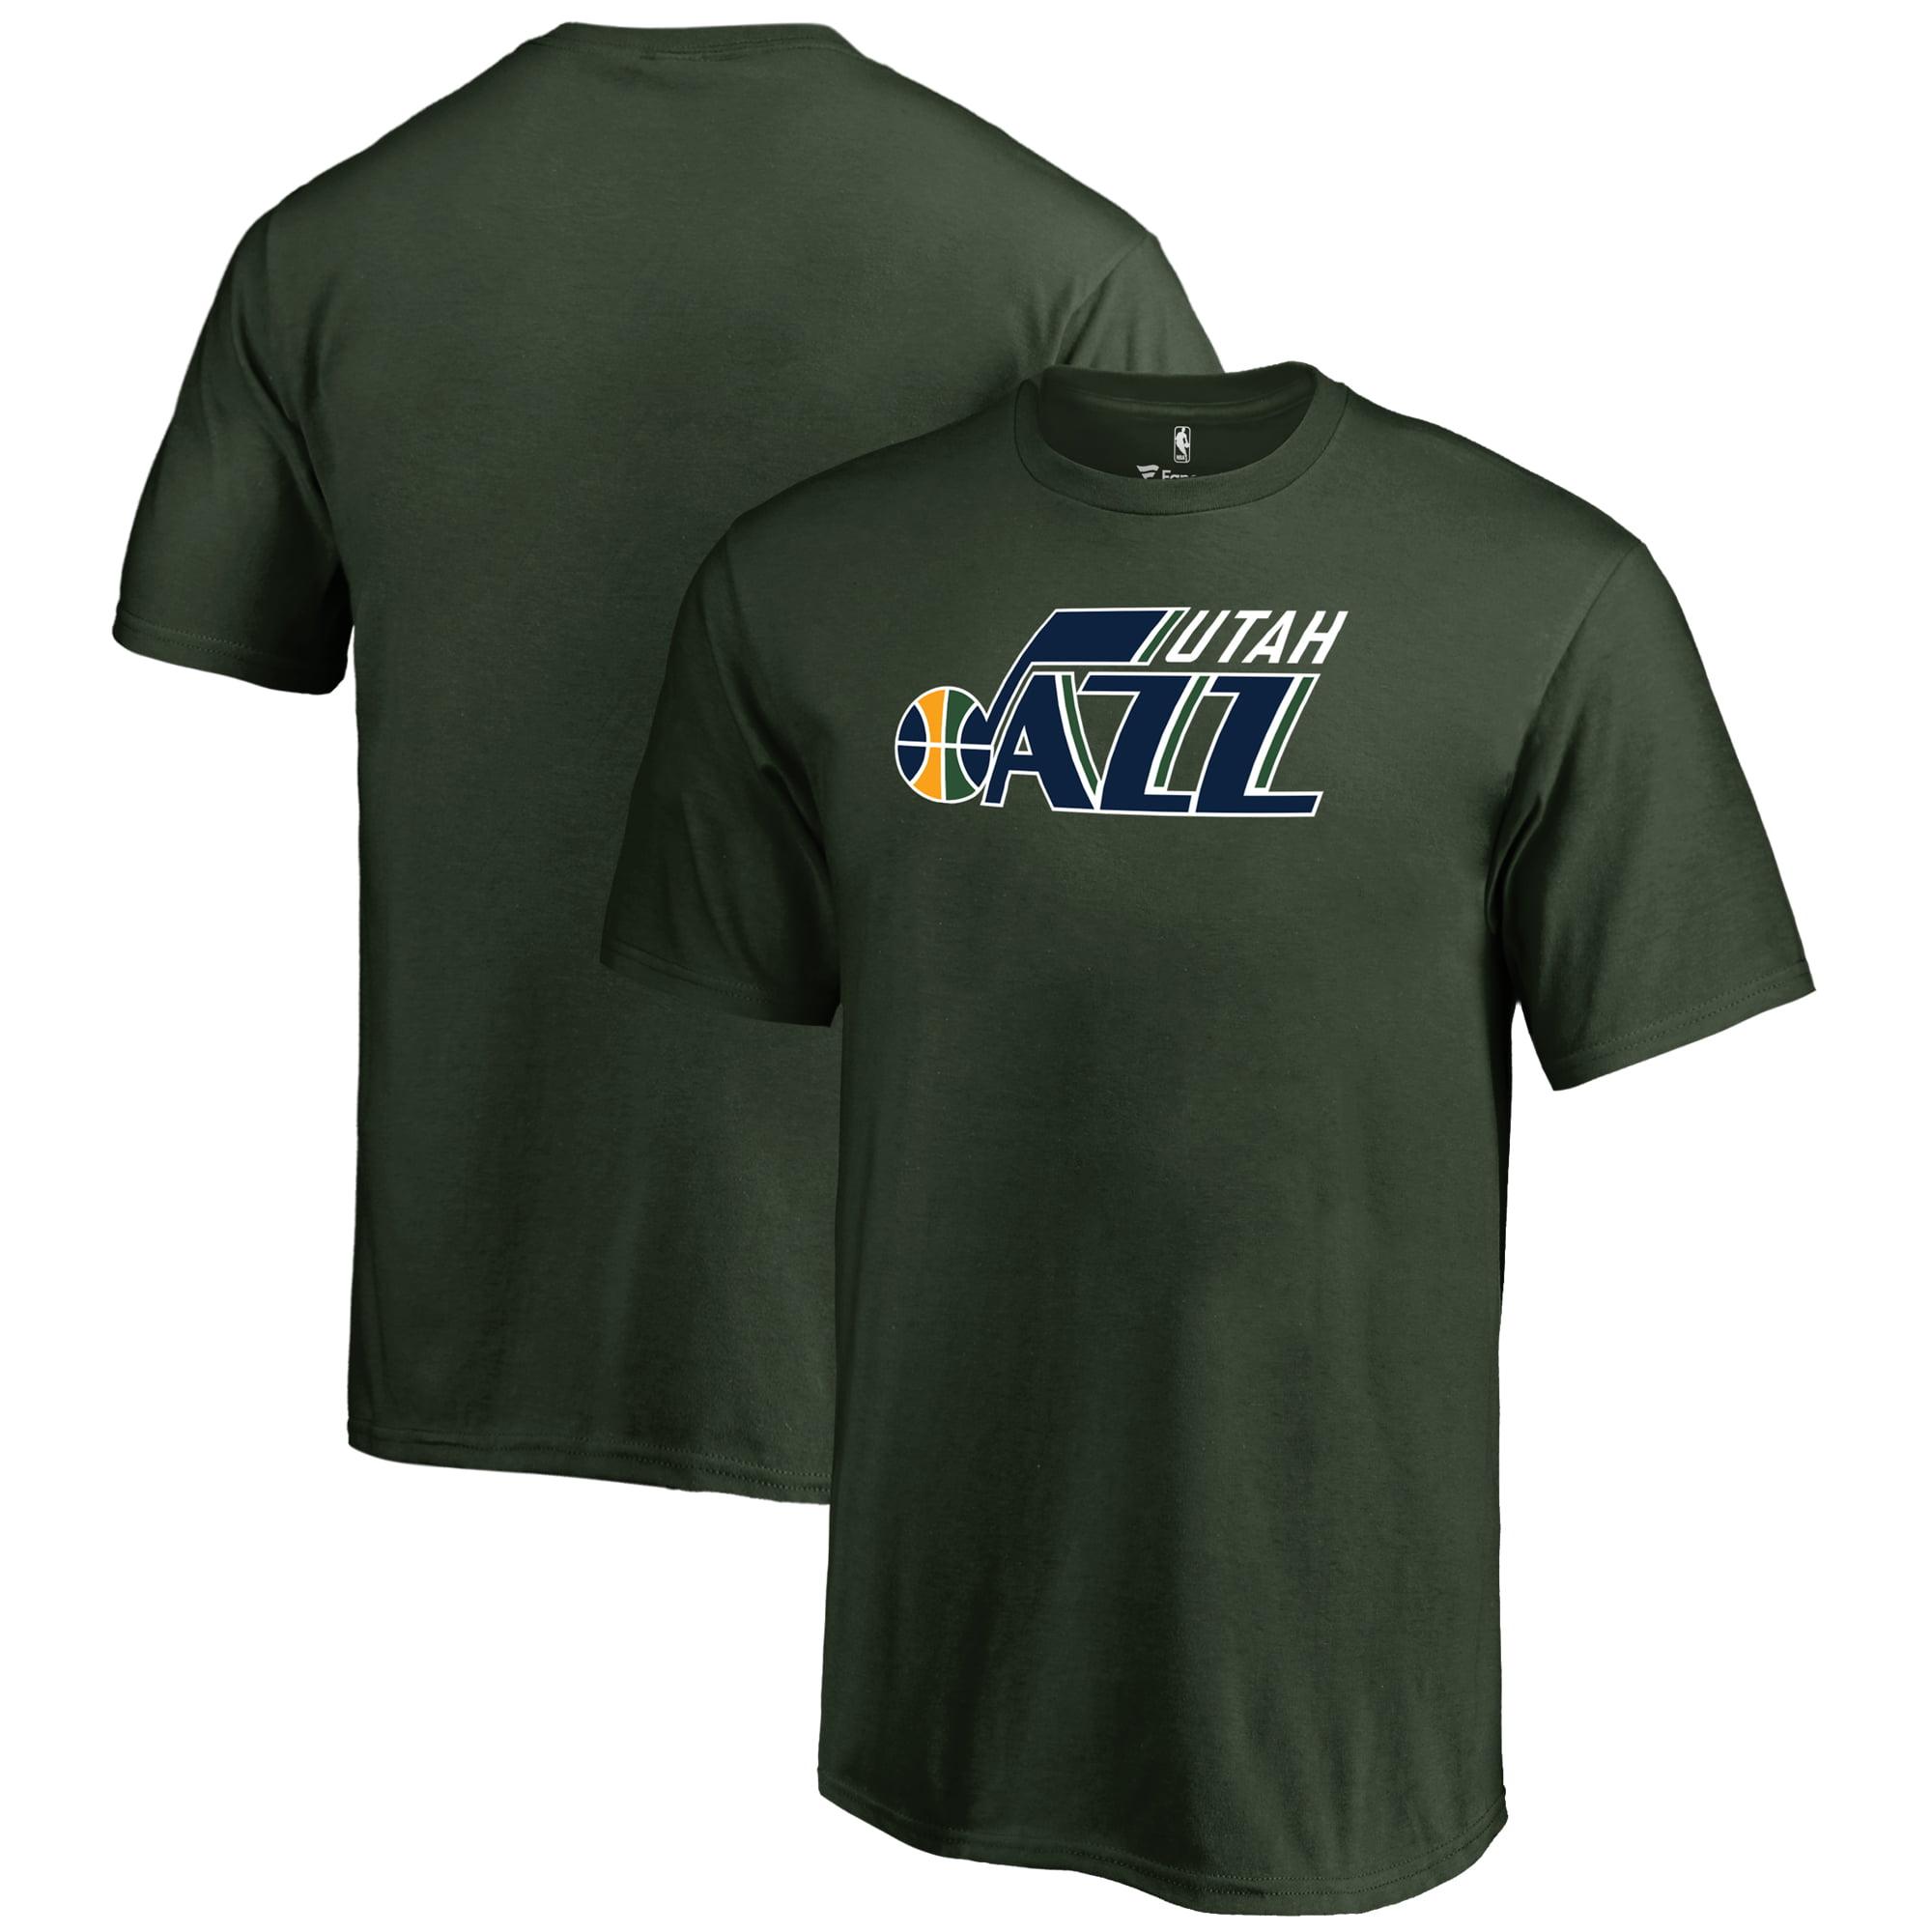 Utah Jazz Fanatics Branded Youth Primary Logo T-Shirt - Green